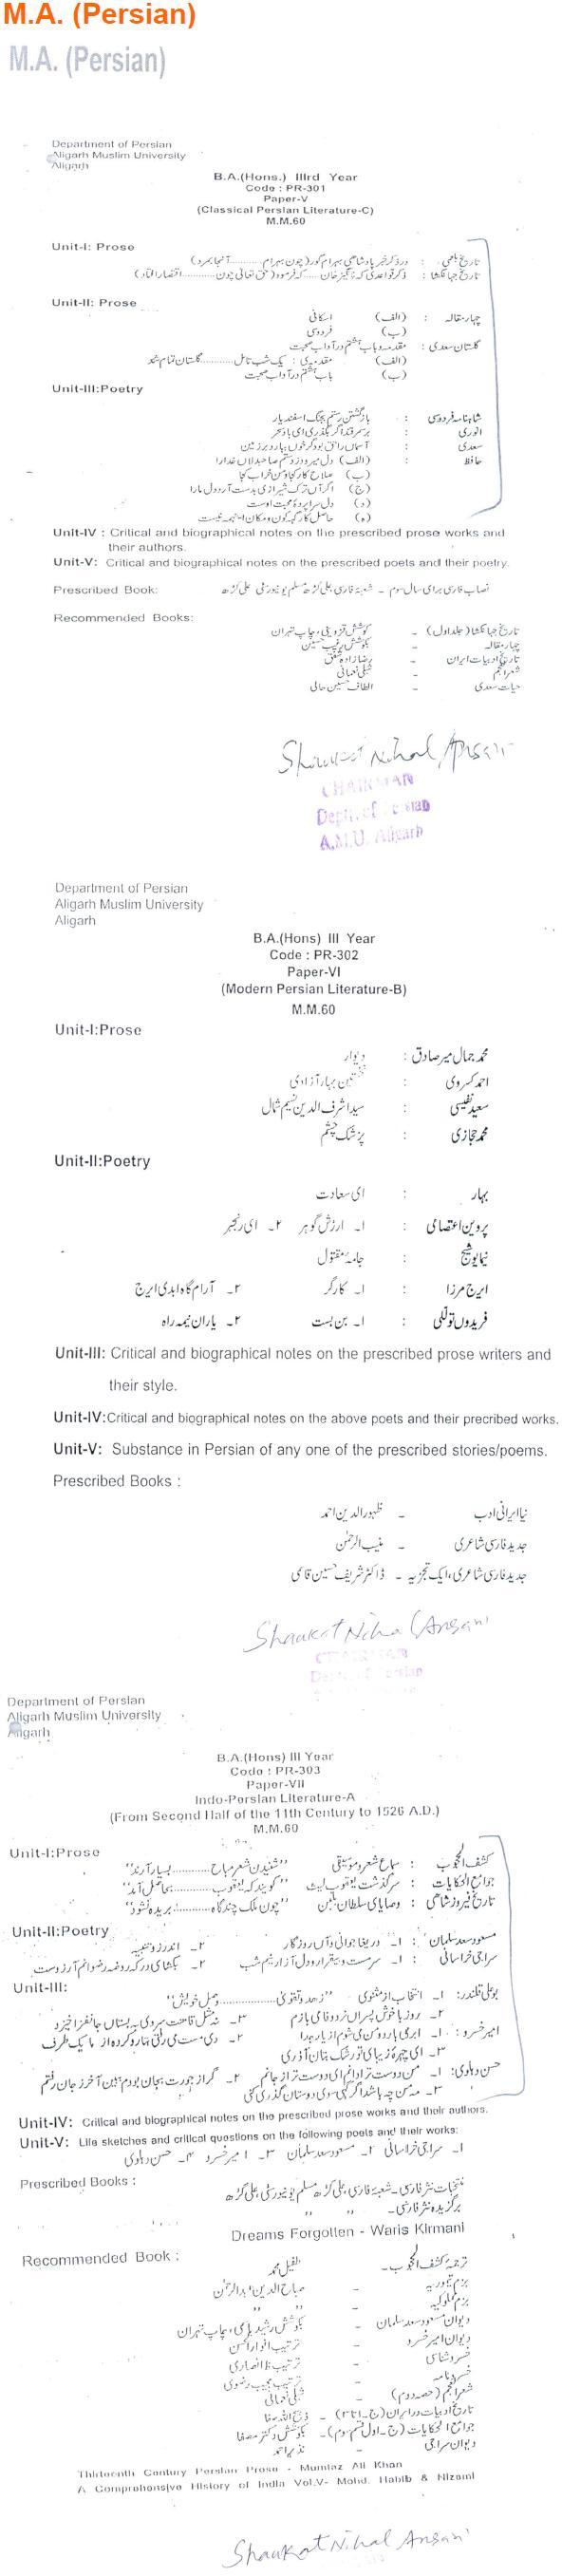 AMU Syllabus - Arts - M. A. Persian